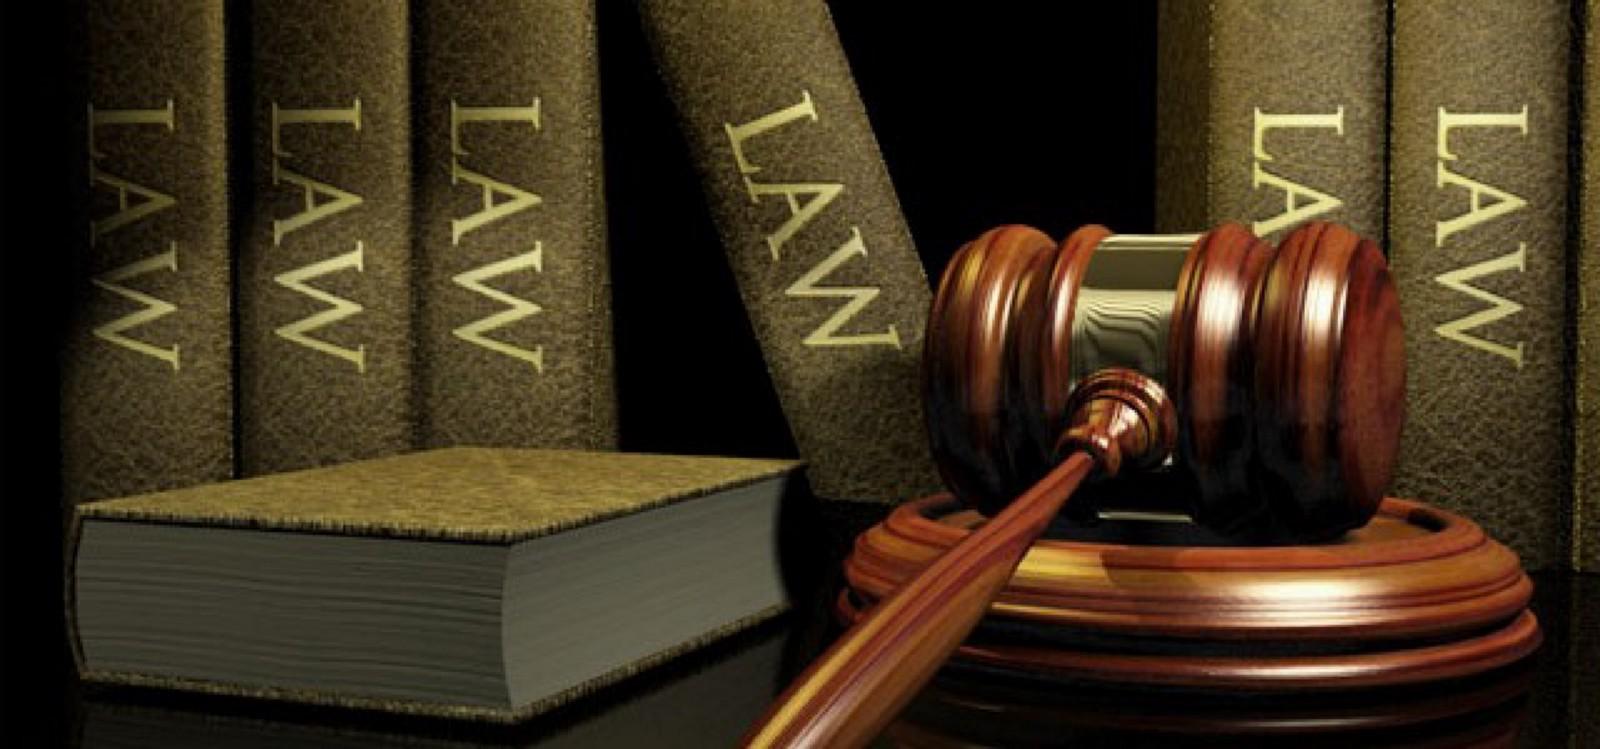 Регламентирующие акты